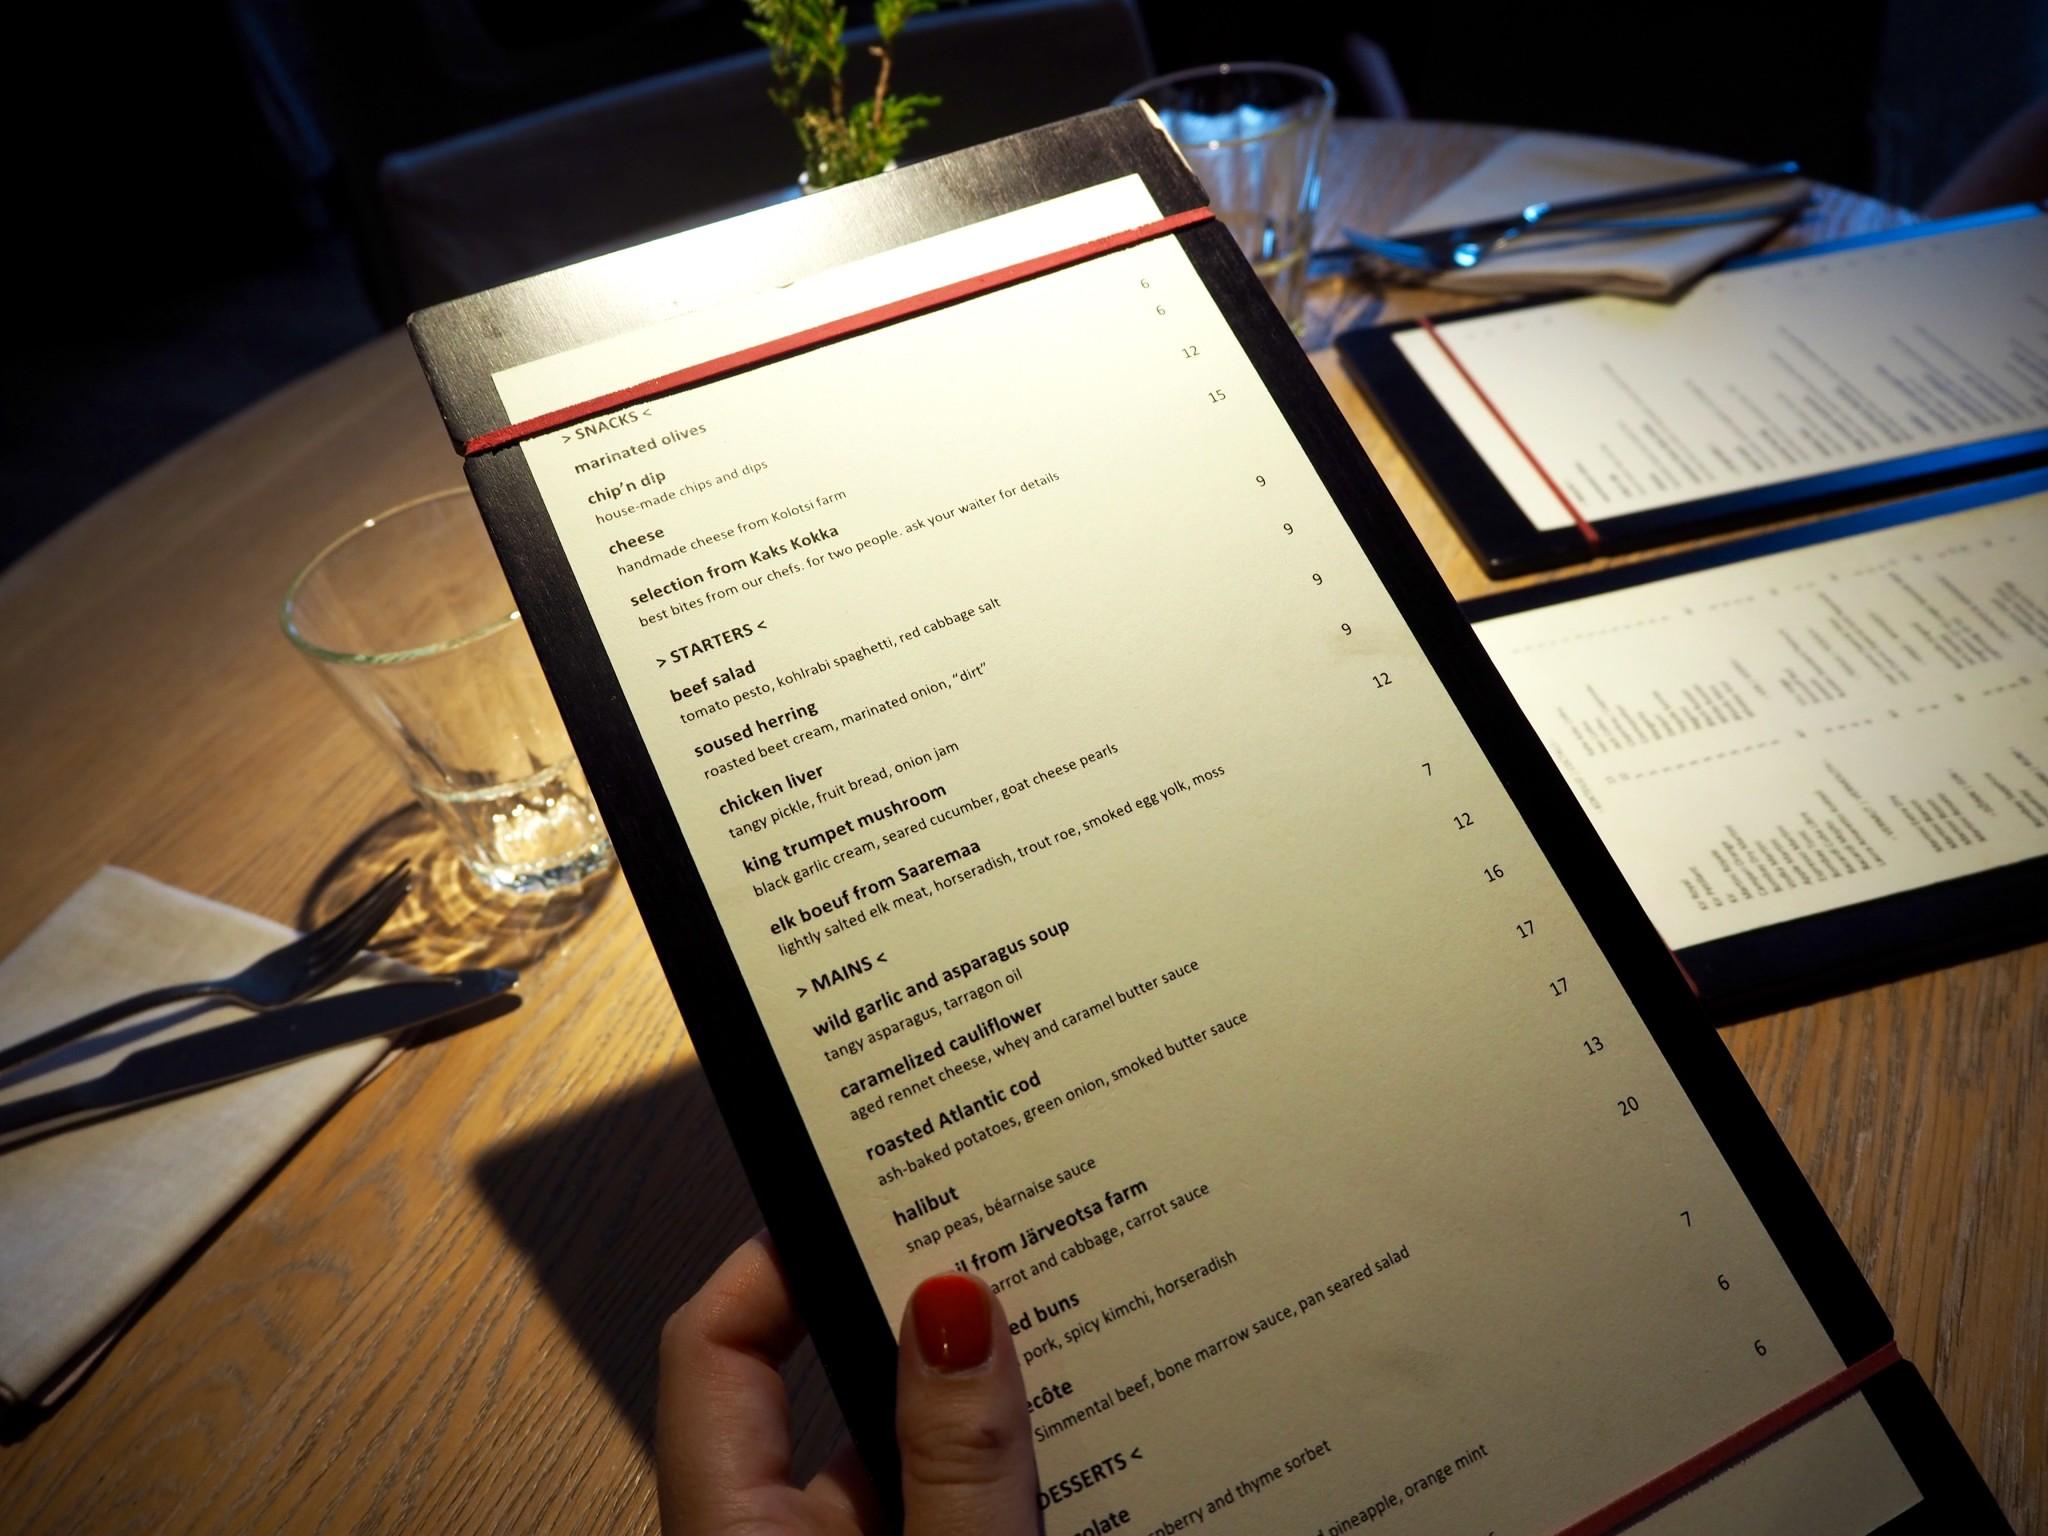 Tallinna ravintola Kaks Kokka menu